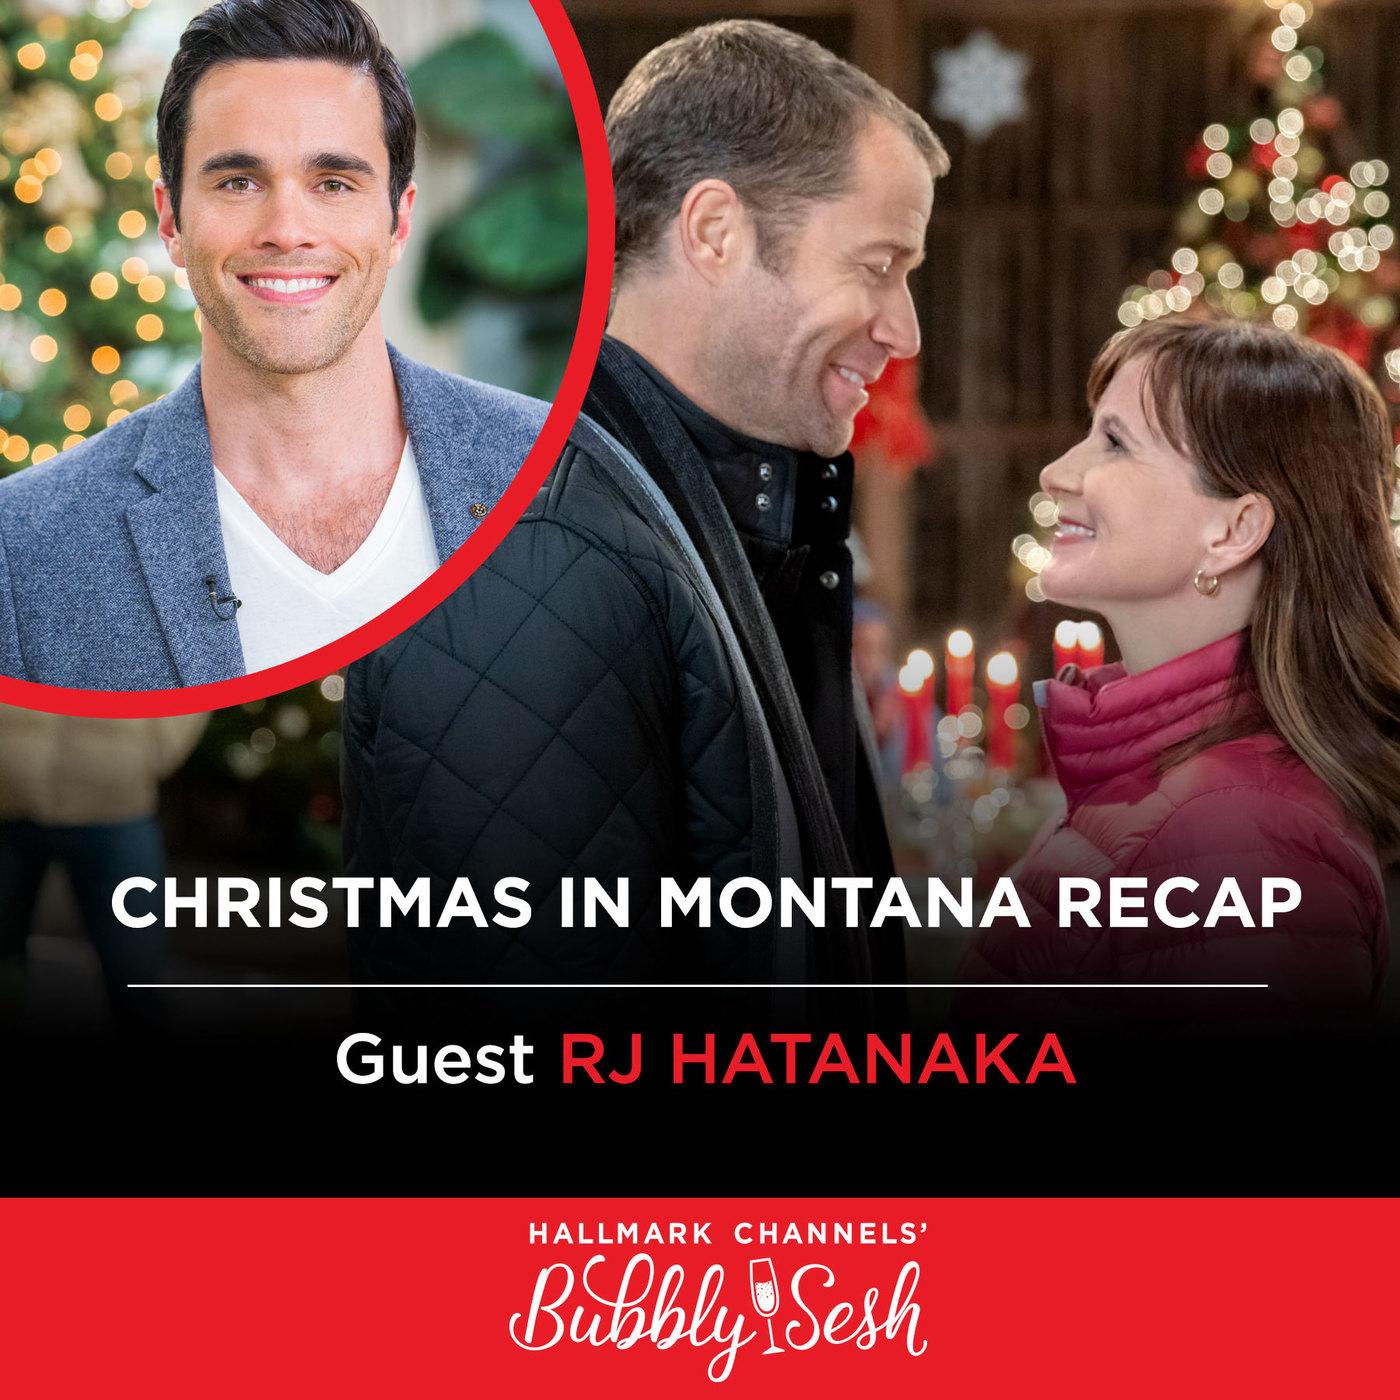 Christmas in Montana Recap with RJ Hatanaka